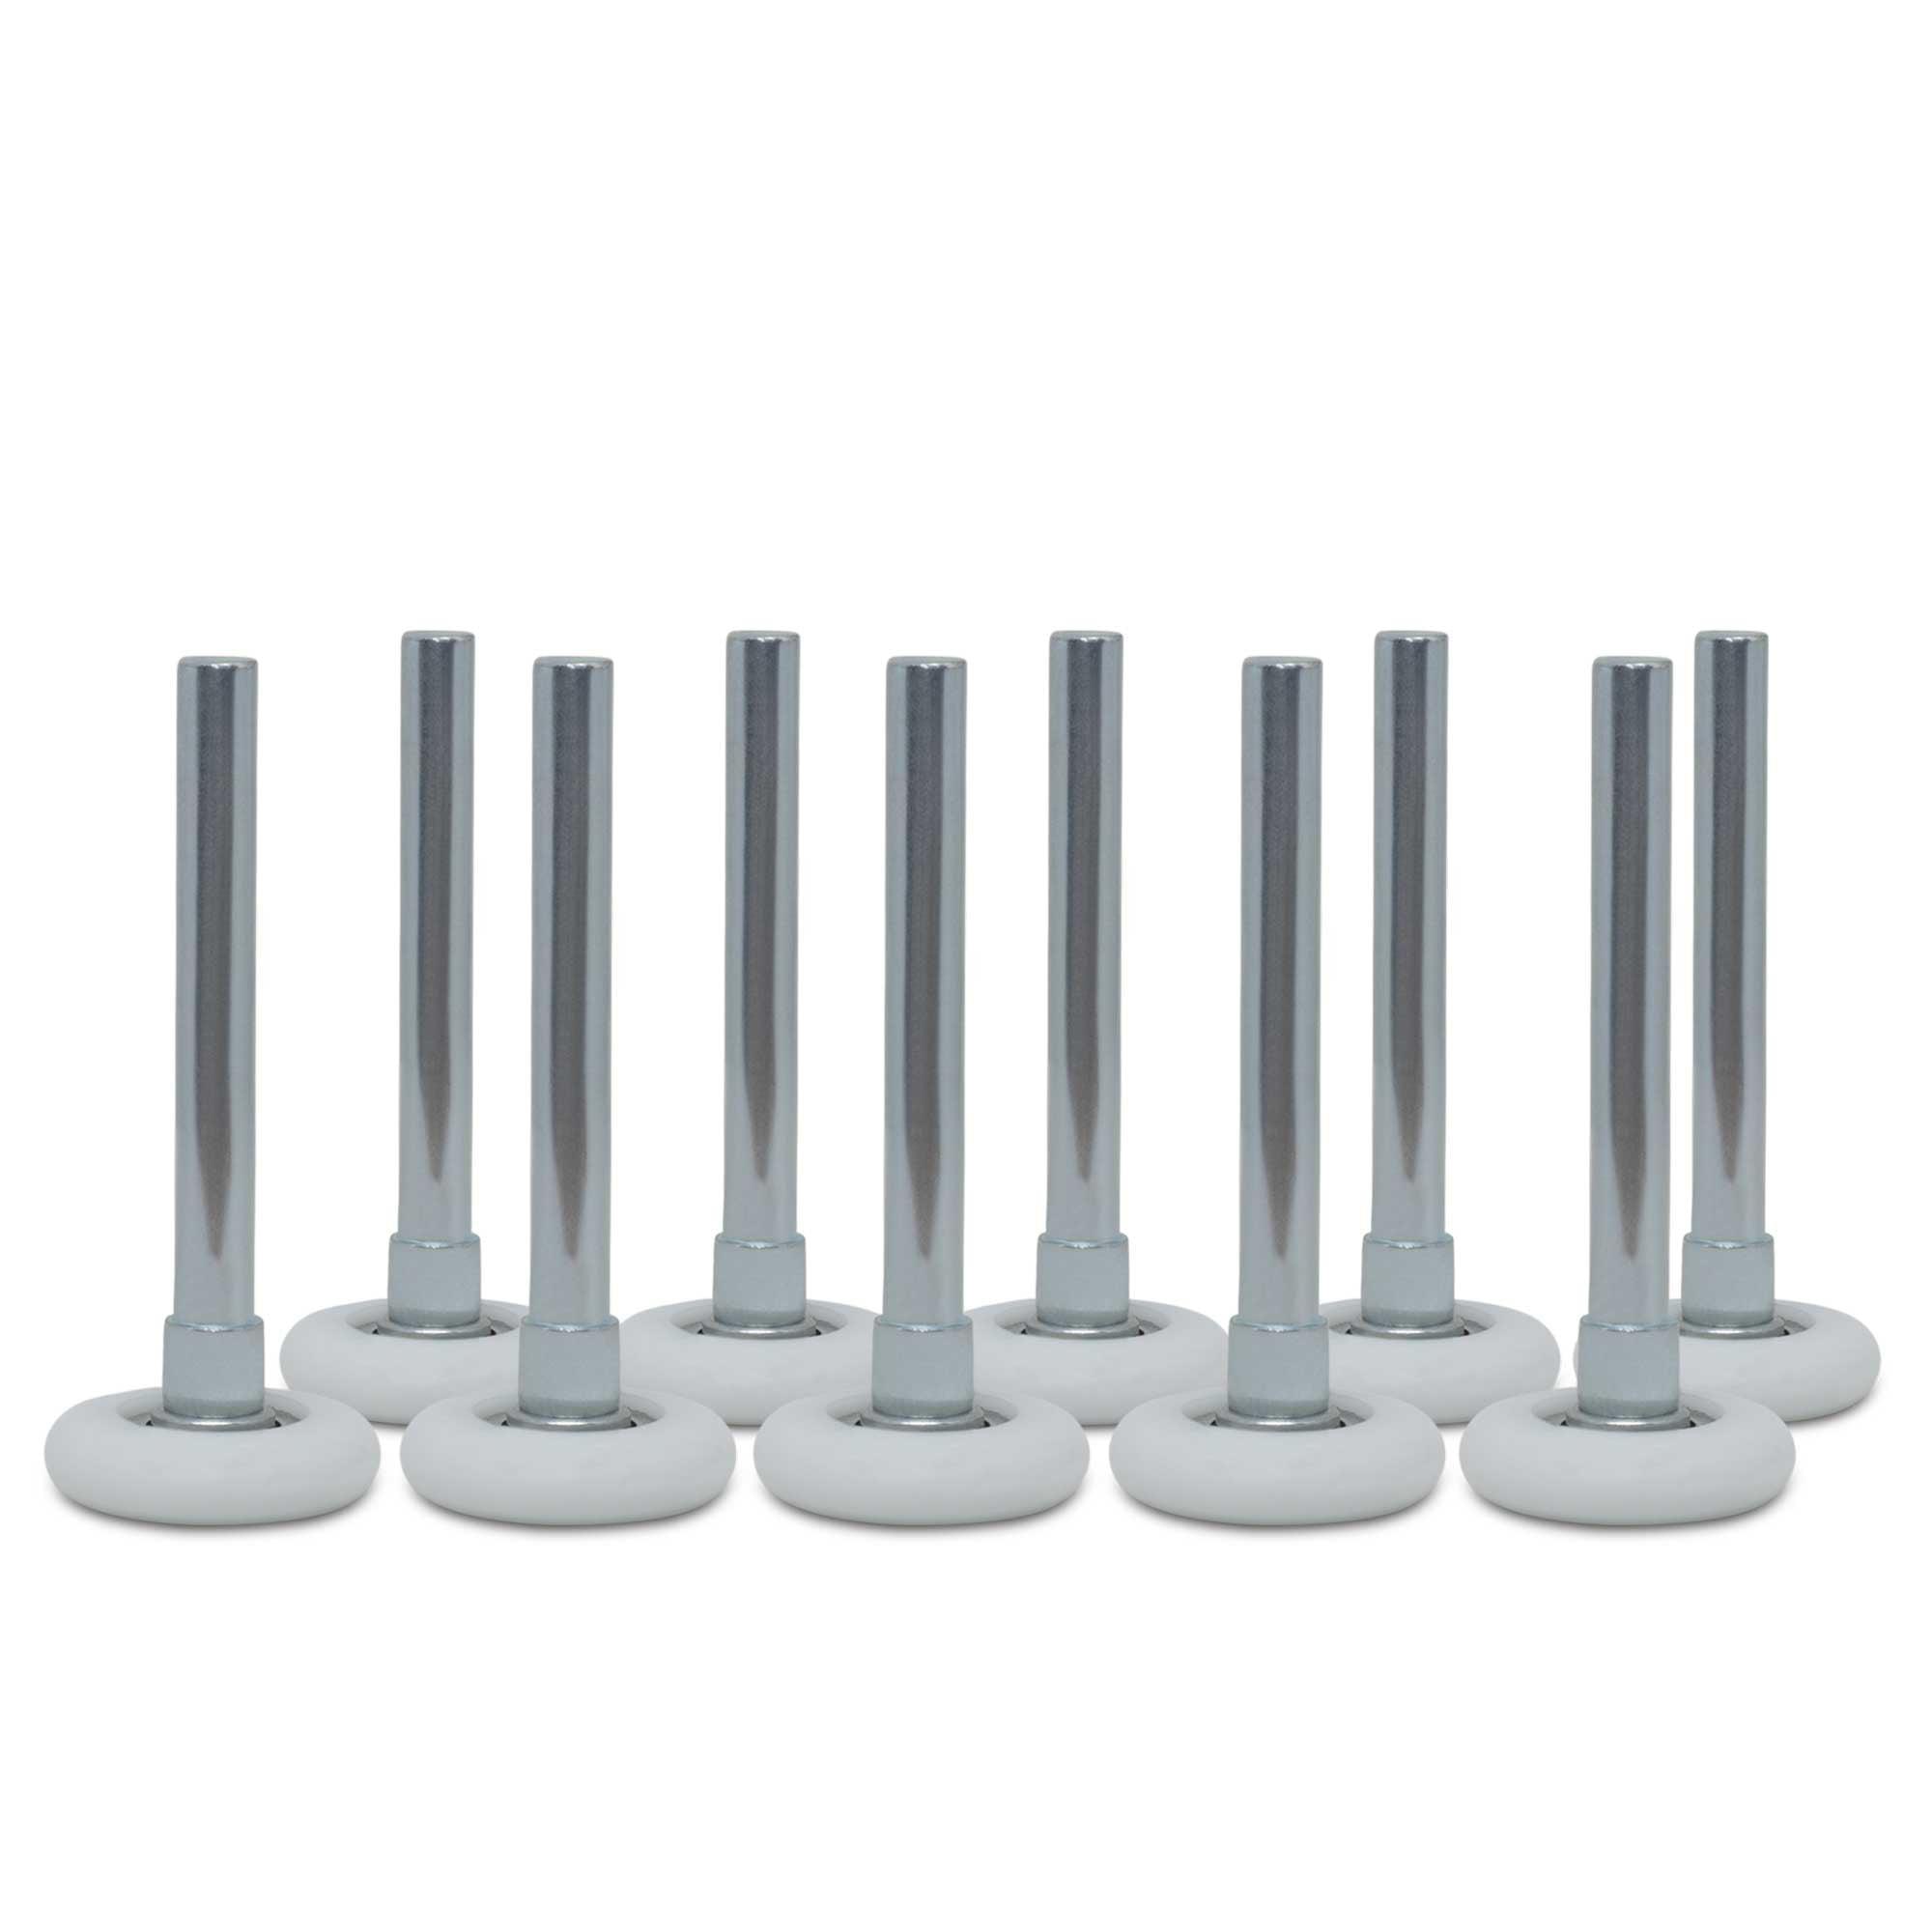 "Garage door rollers - 2"" Premium Nylon & Steel, 10 ball-bearings & 4"" stem (10-pack)"